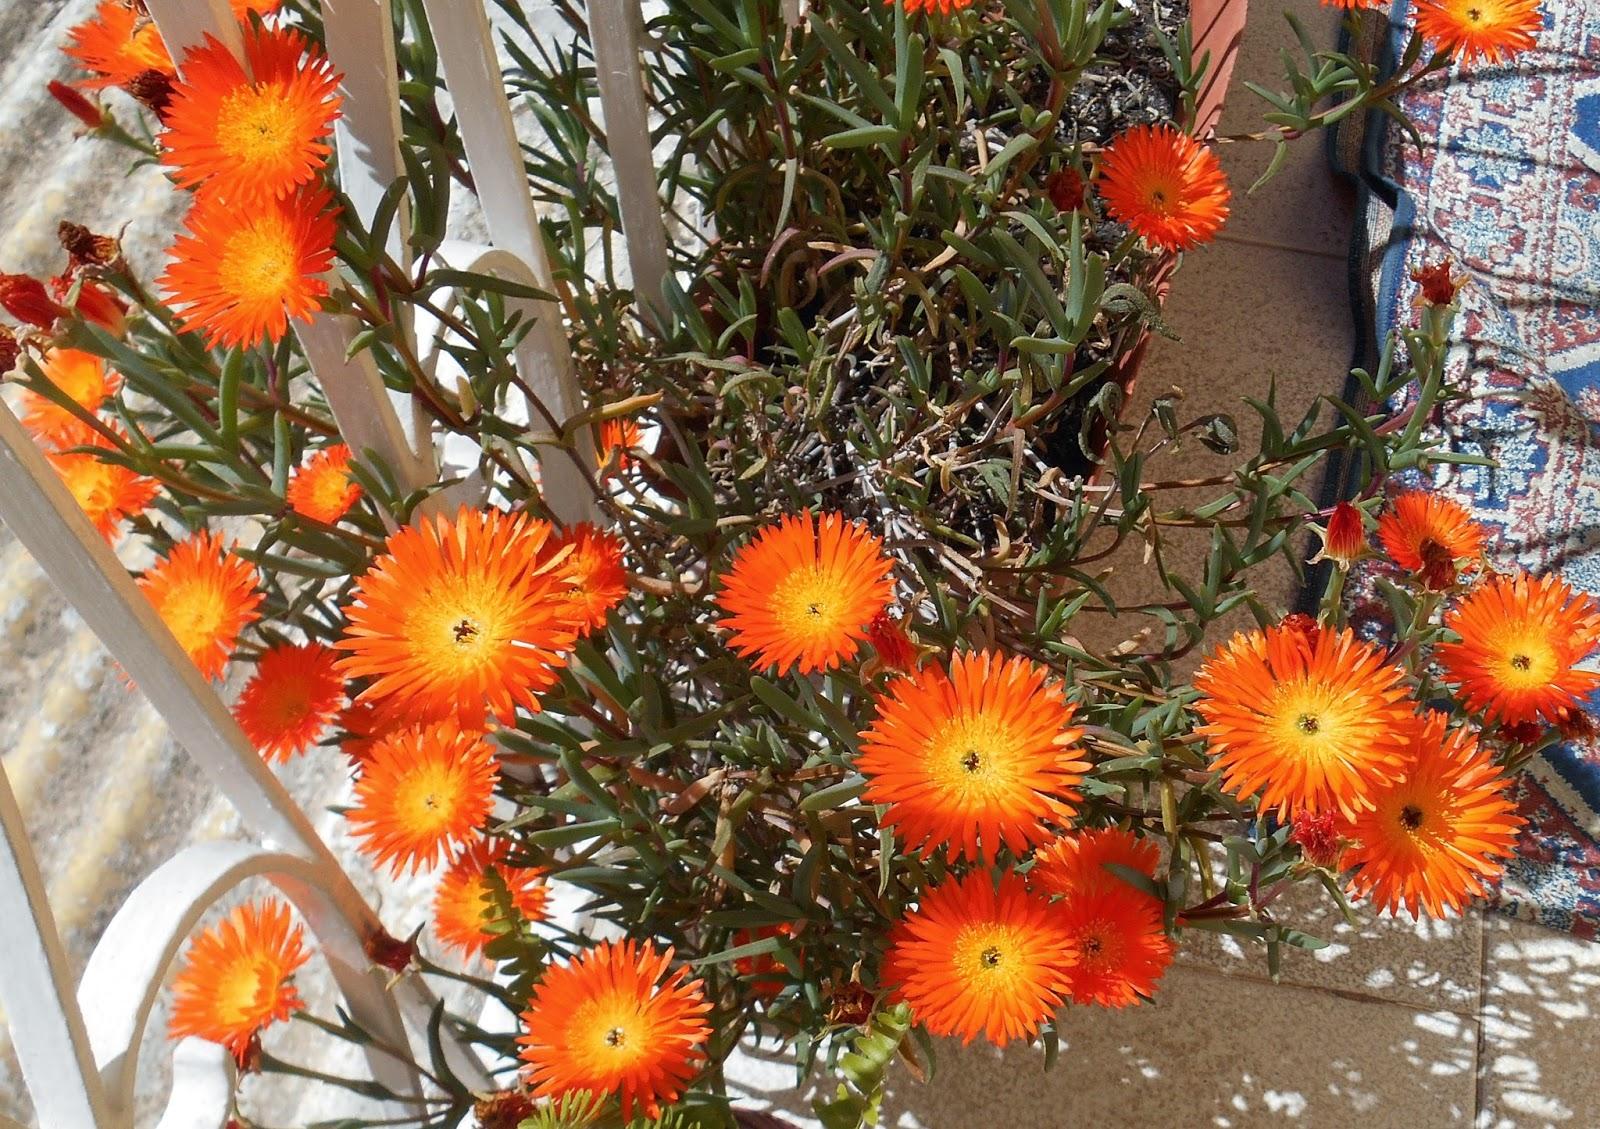 erbe grasse fiorite